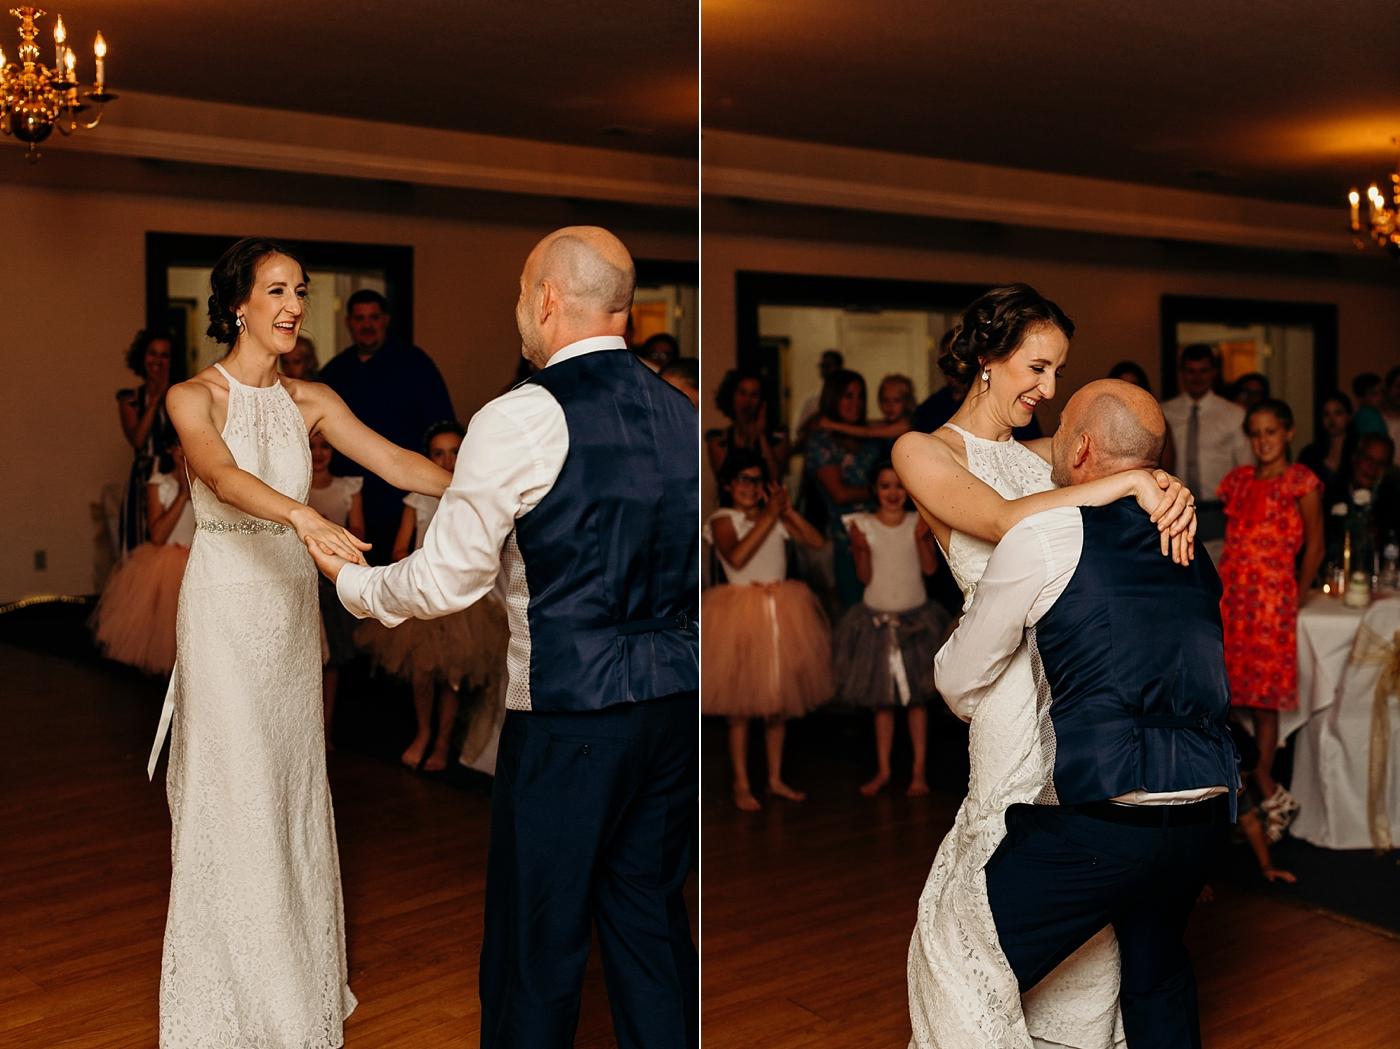 Chateau-Michelle-Wedding-Julia+JuanLuis_TheHeartlandersCo2018LA-381.jpg